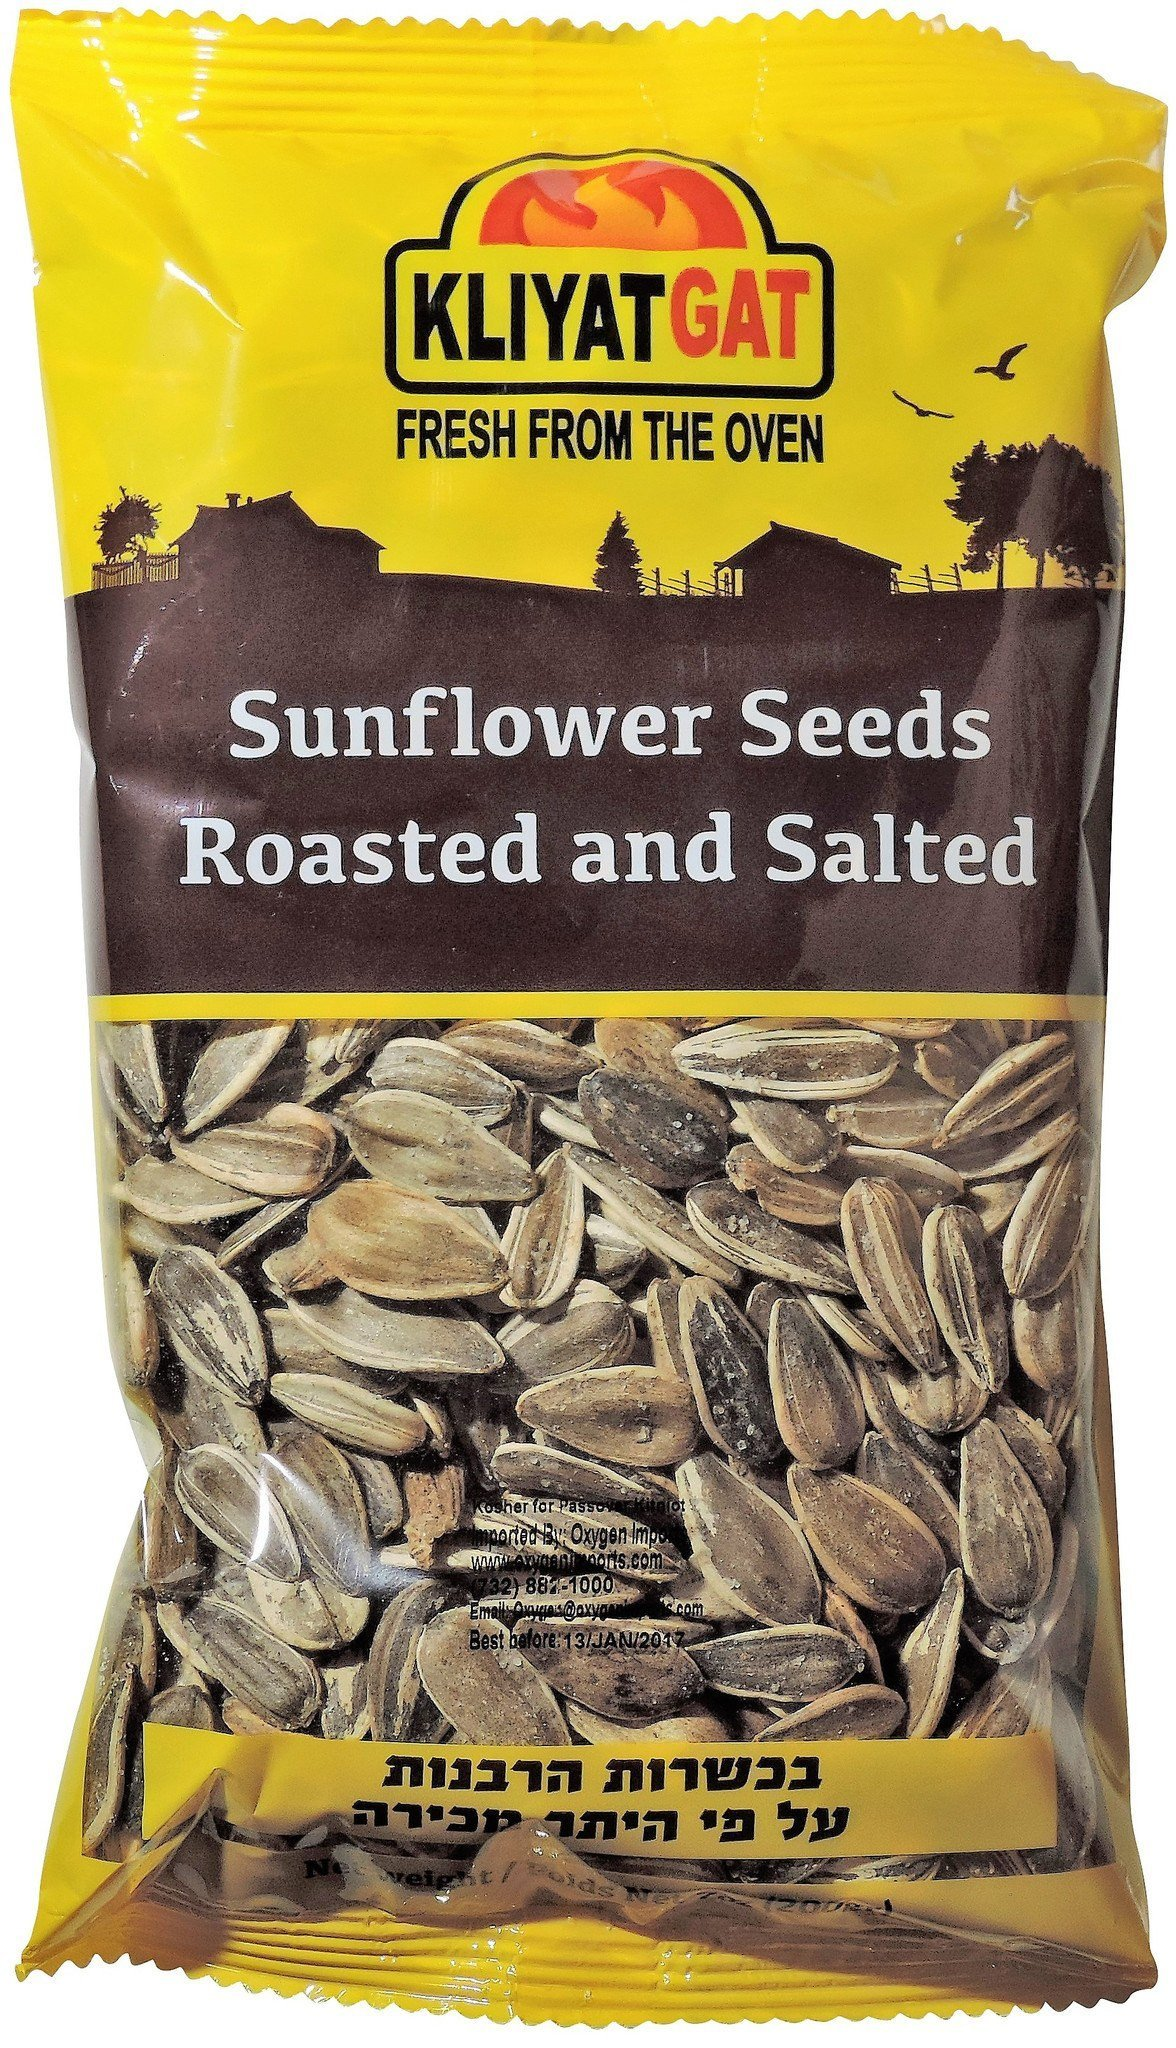 Kliyat Gat Sunflower Seeds Roasted and Salted 7 oz - Pack of 6